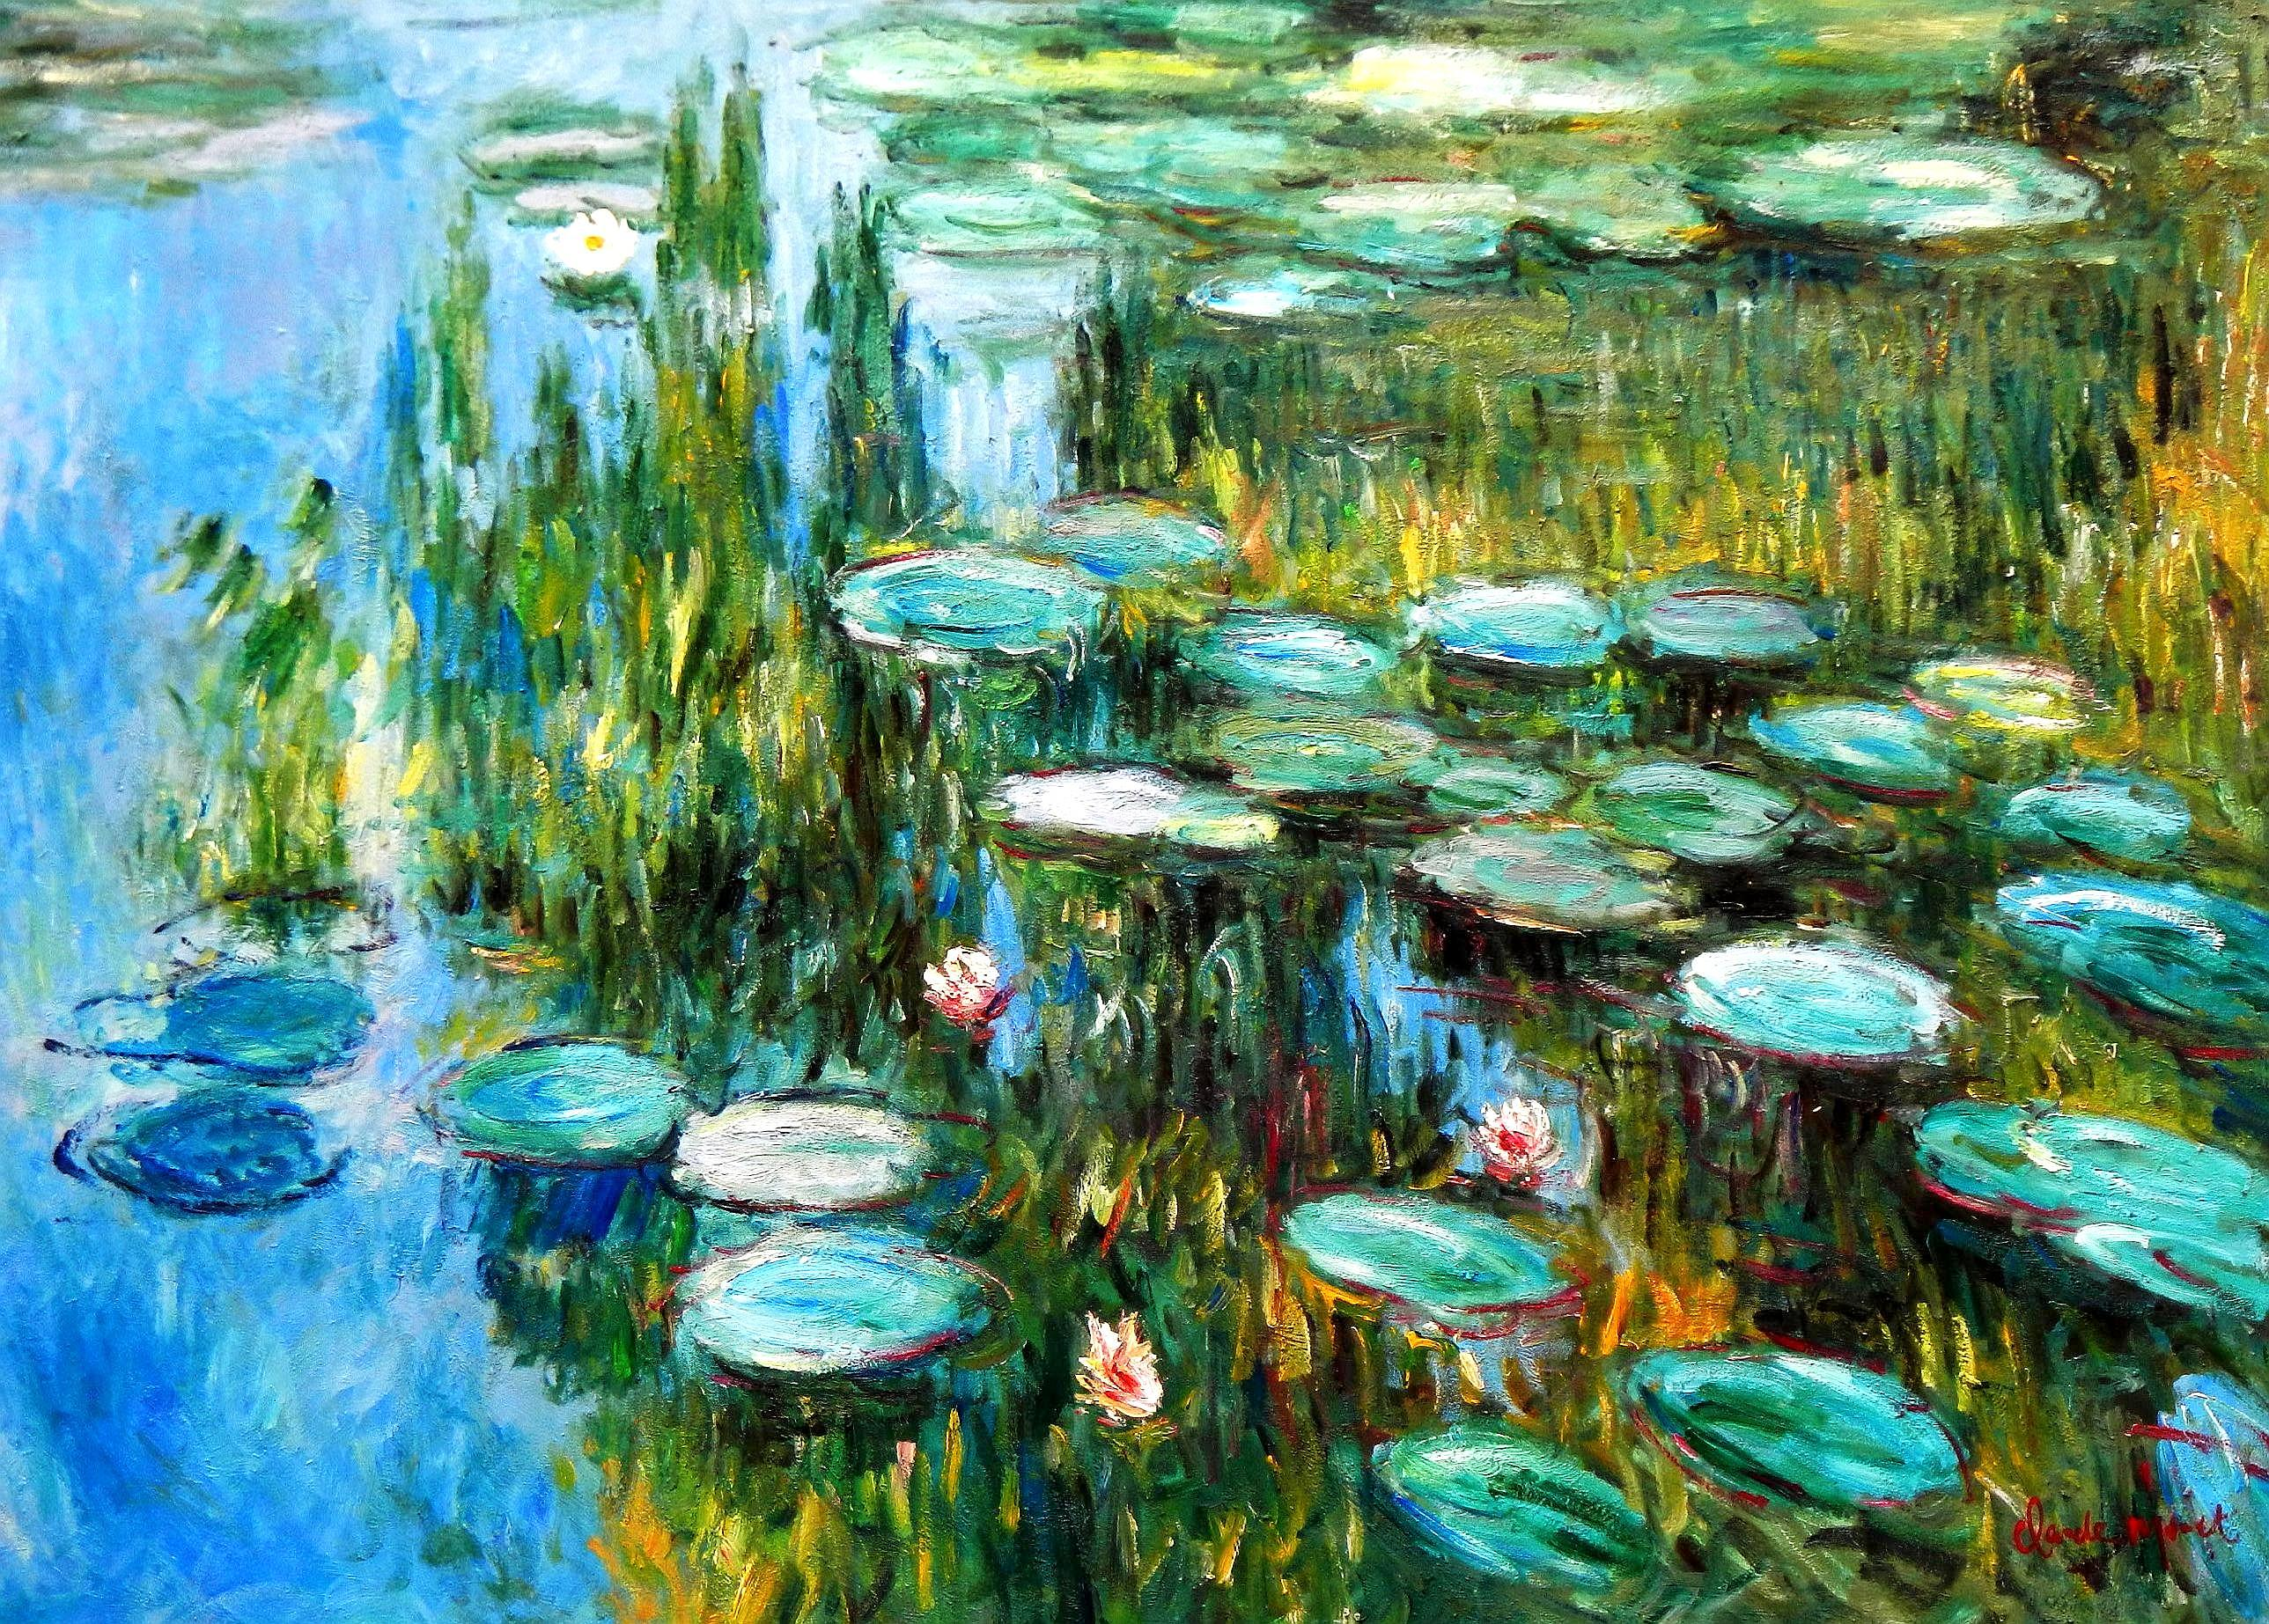 Claude Monet - Seerosen im Frühling i94421 80x110cm Ölgemälde handgemalt